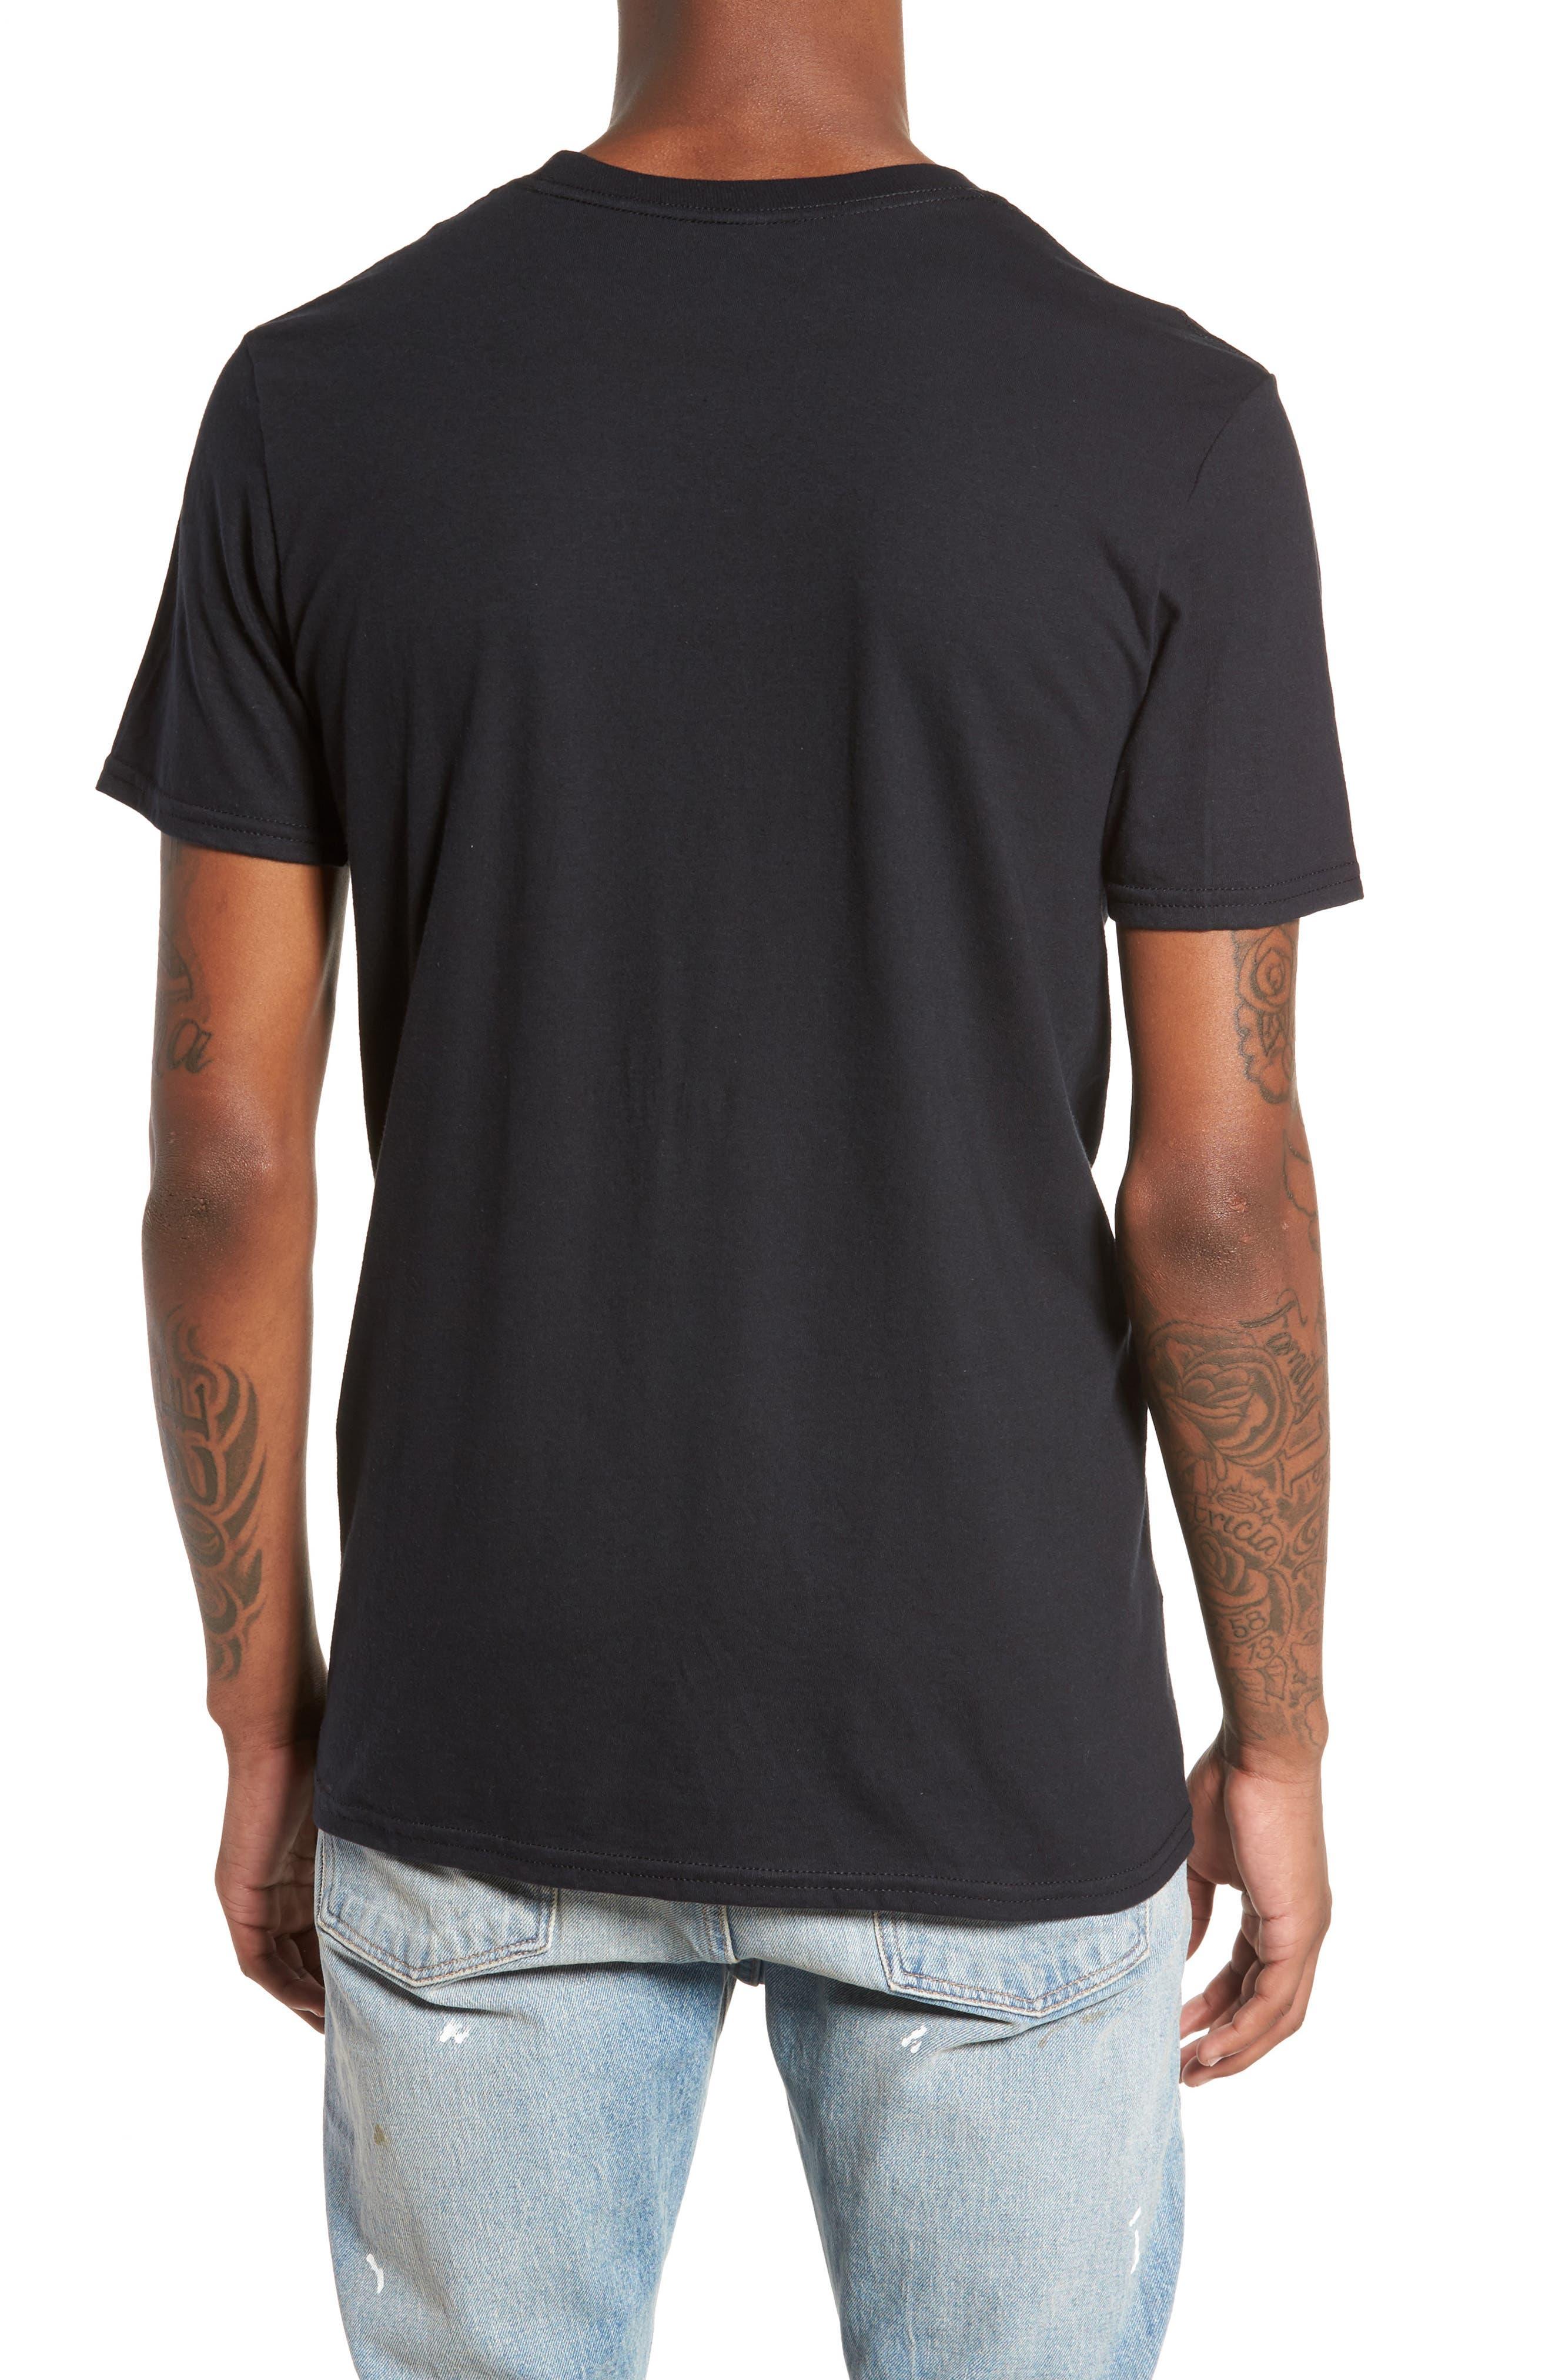 Bone Thugs-n-Harmony T-Shirt,                             Alternate thumbnail 2, color,                             Black Tee Bone Thugs